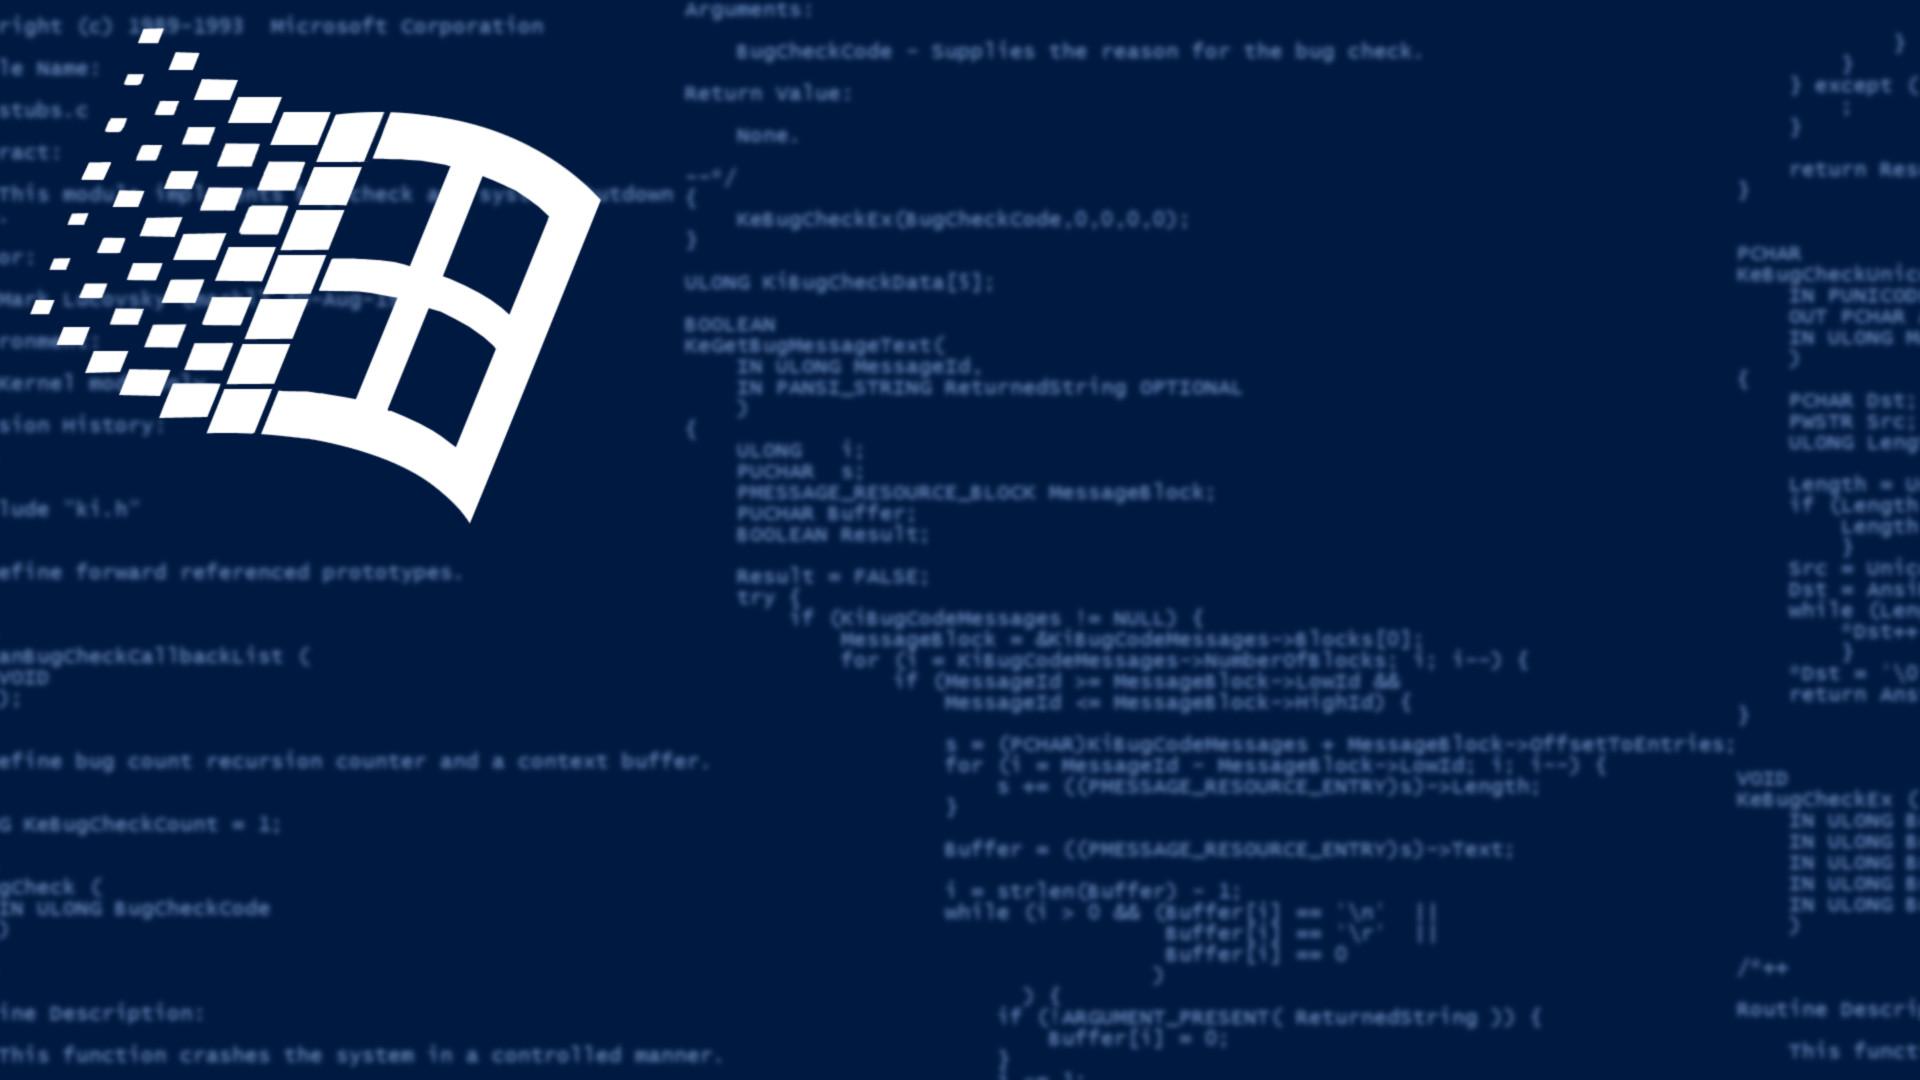 Windows Nt Wallpaper View topic – neko2k's wallpaper collection .